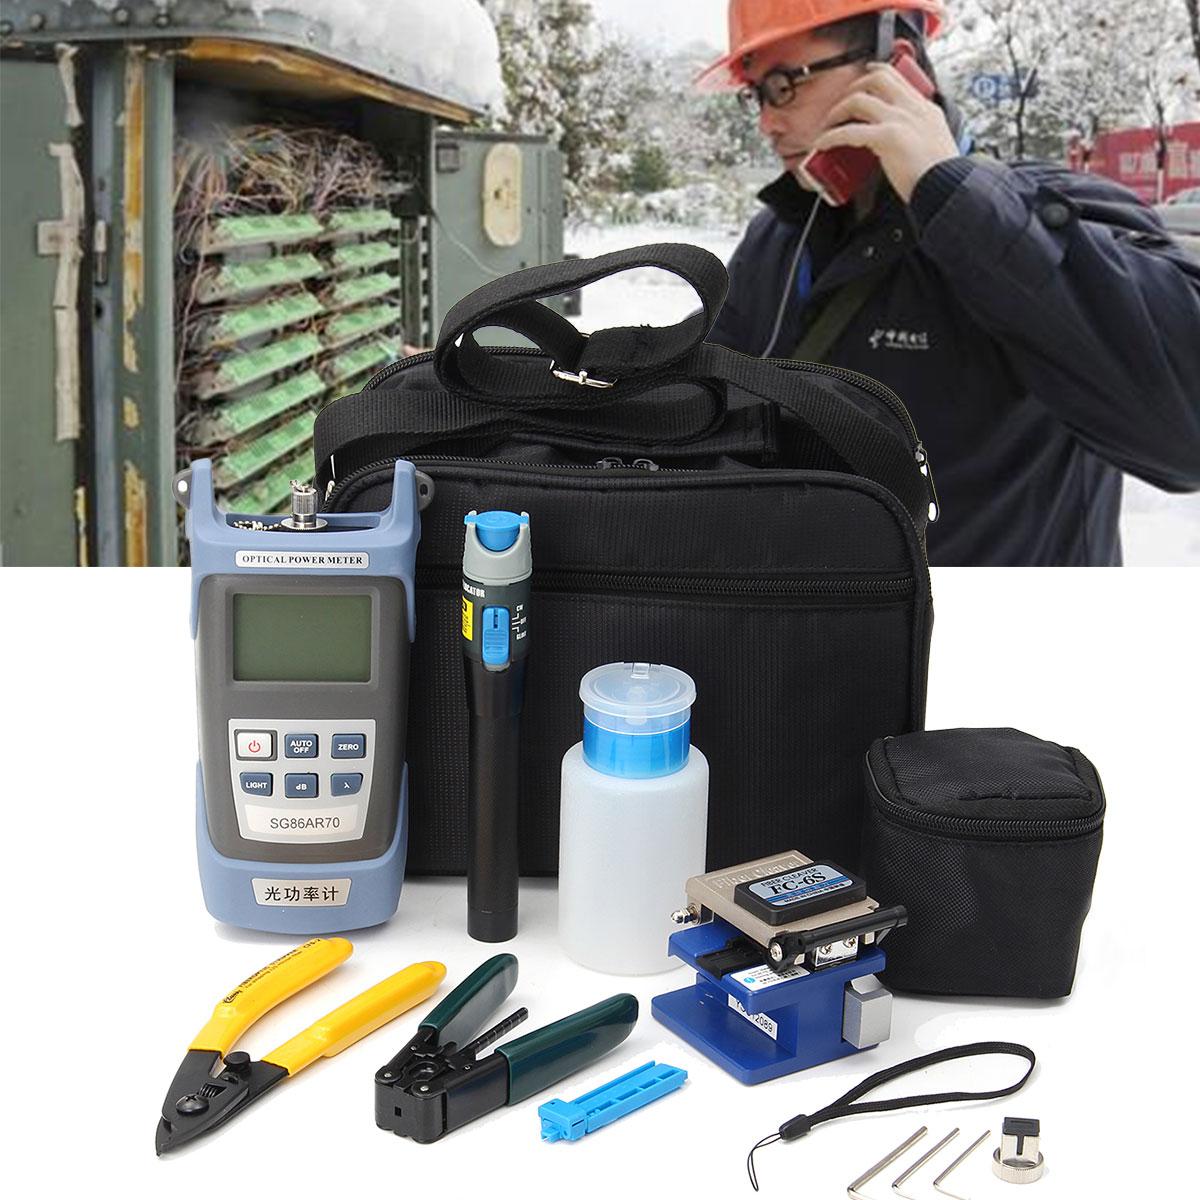 12 pz/set In Fibra Ottica FTTH Tool Kit per FC-6S In Fibra di Mannaia e Misuratore di Potenza Ottica 5 km di Visual Fault Locator wire stripper